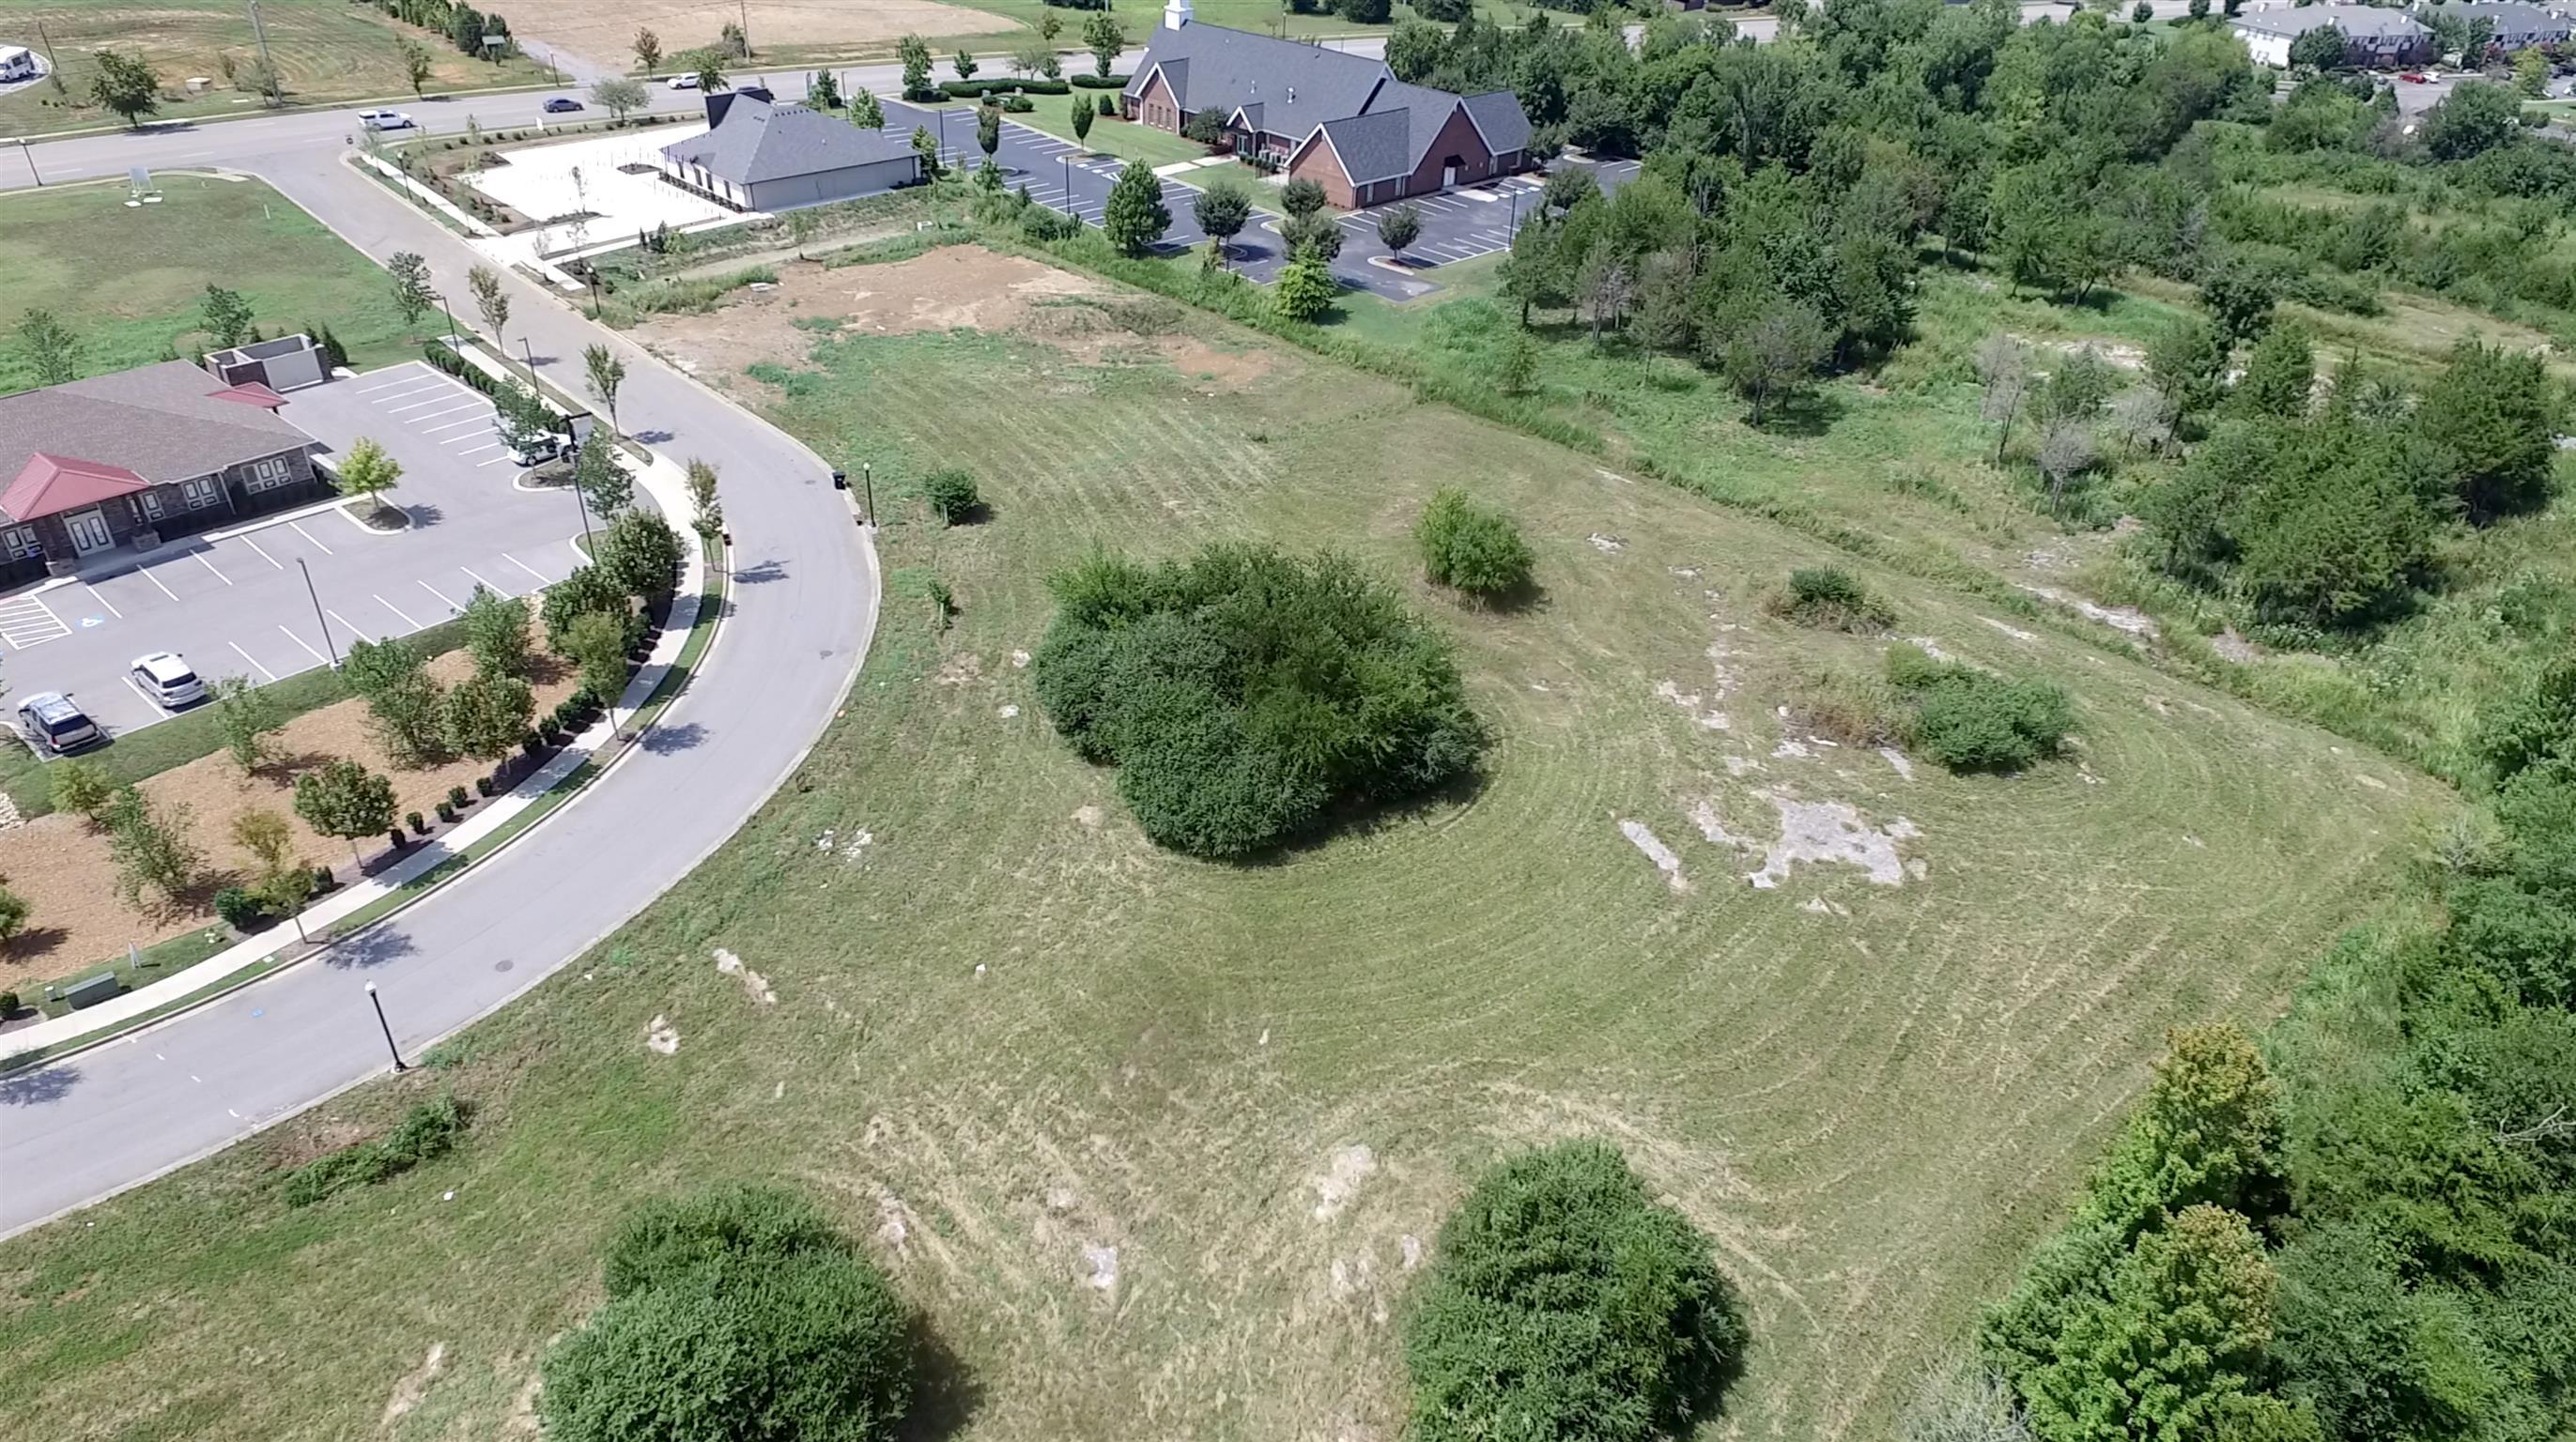 0 Luke Ct Lot#5, Murfreesboro, TN 37128 - Murfreesboro, TN real estate listing